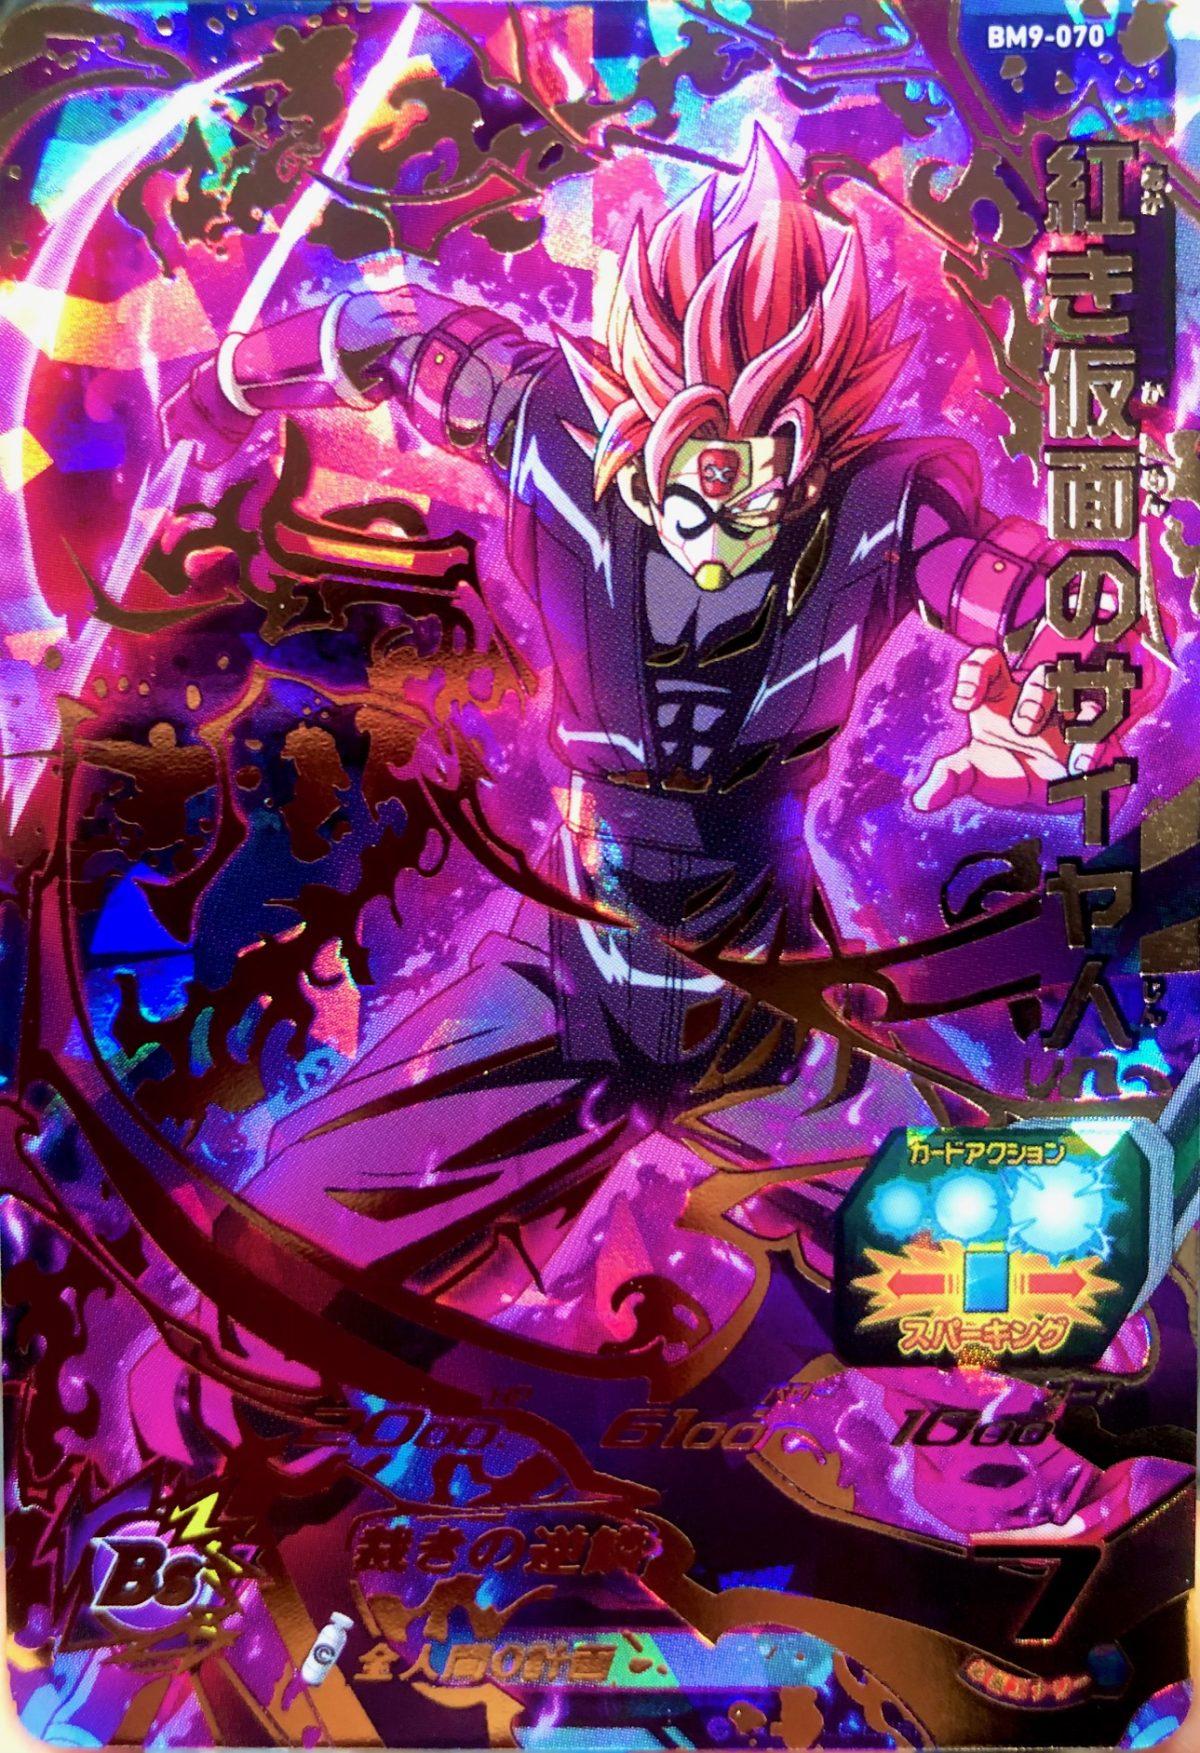 BM9-070 紅き仮面のサイヤ人(超サイヤ人ロゼ2)